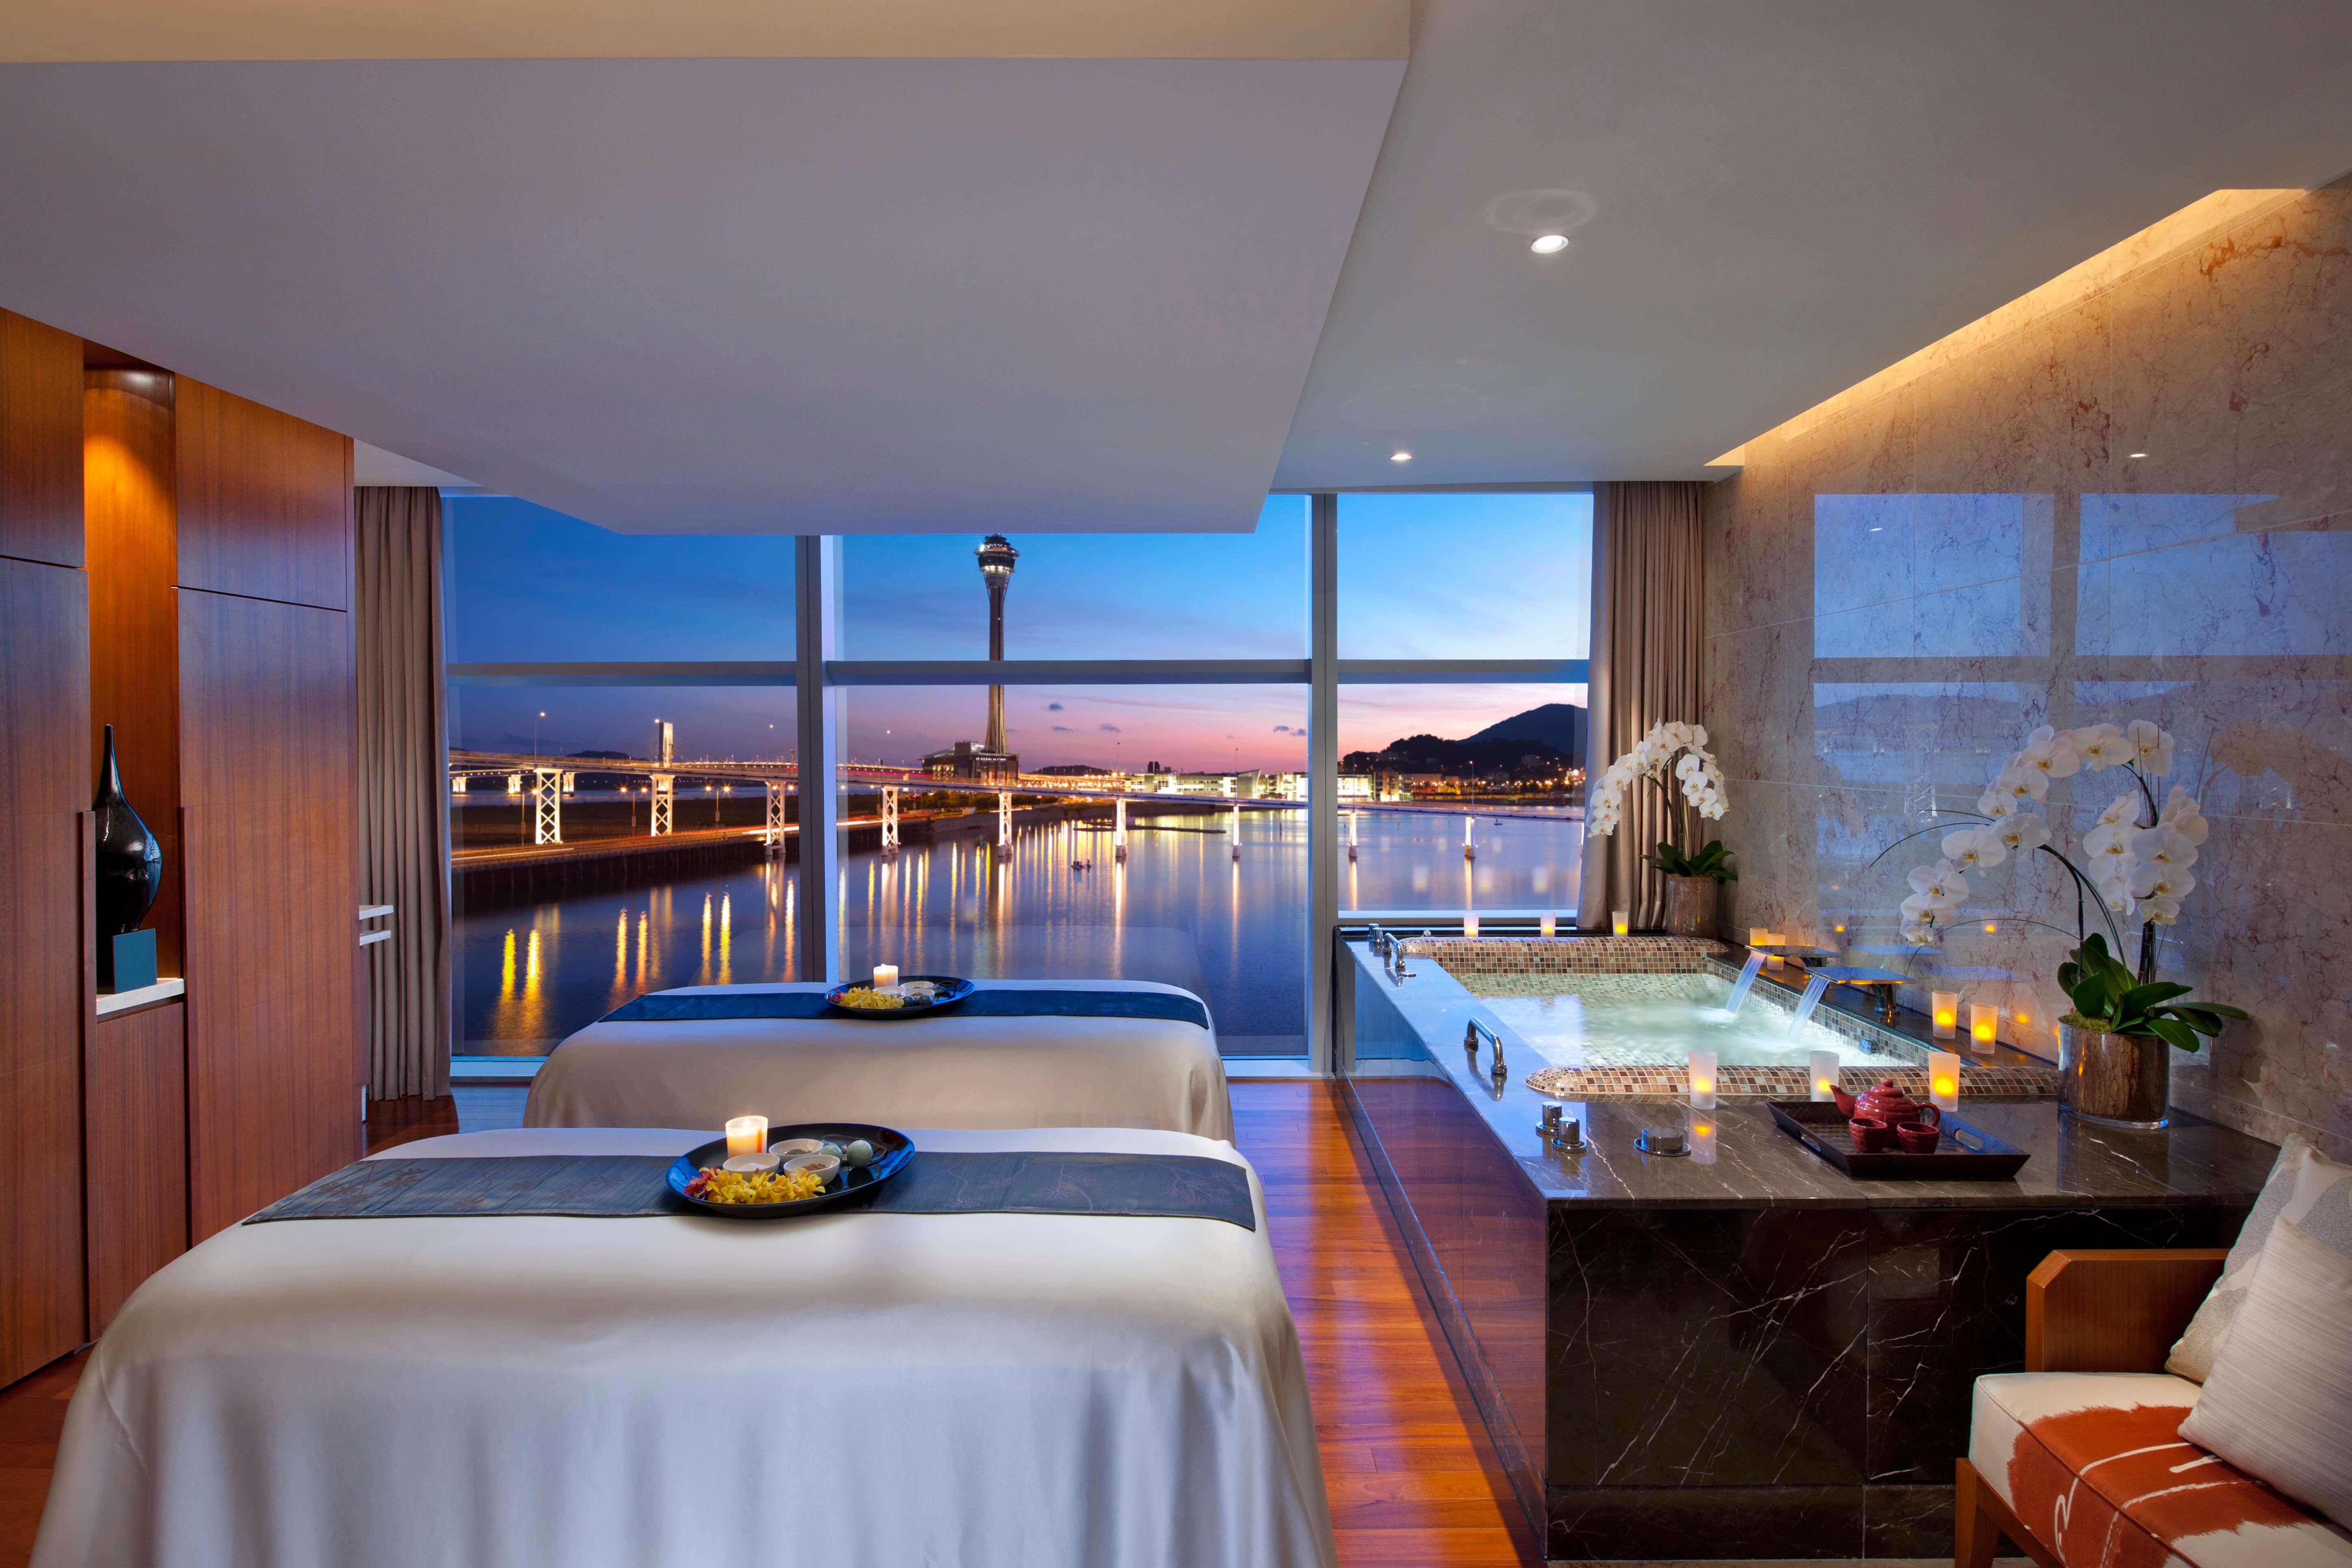 Spa treatment room with a luxury bathtub